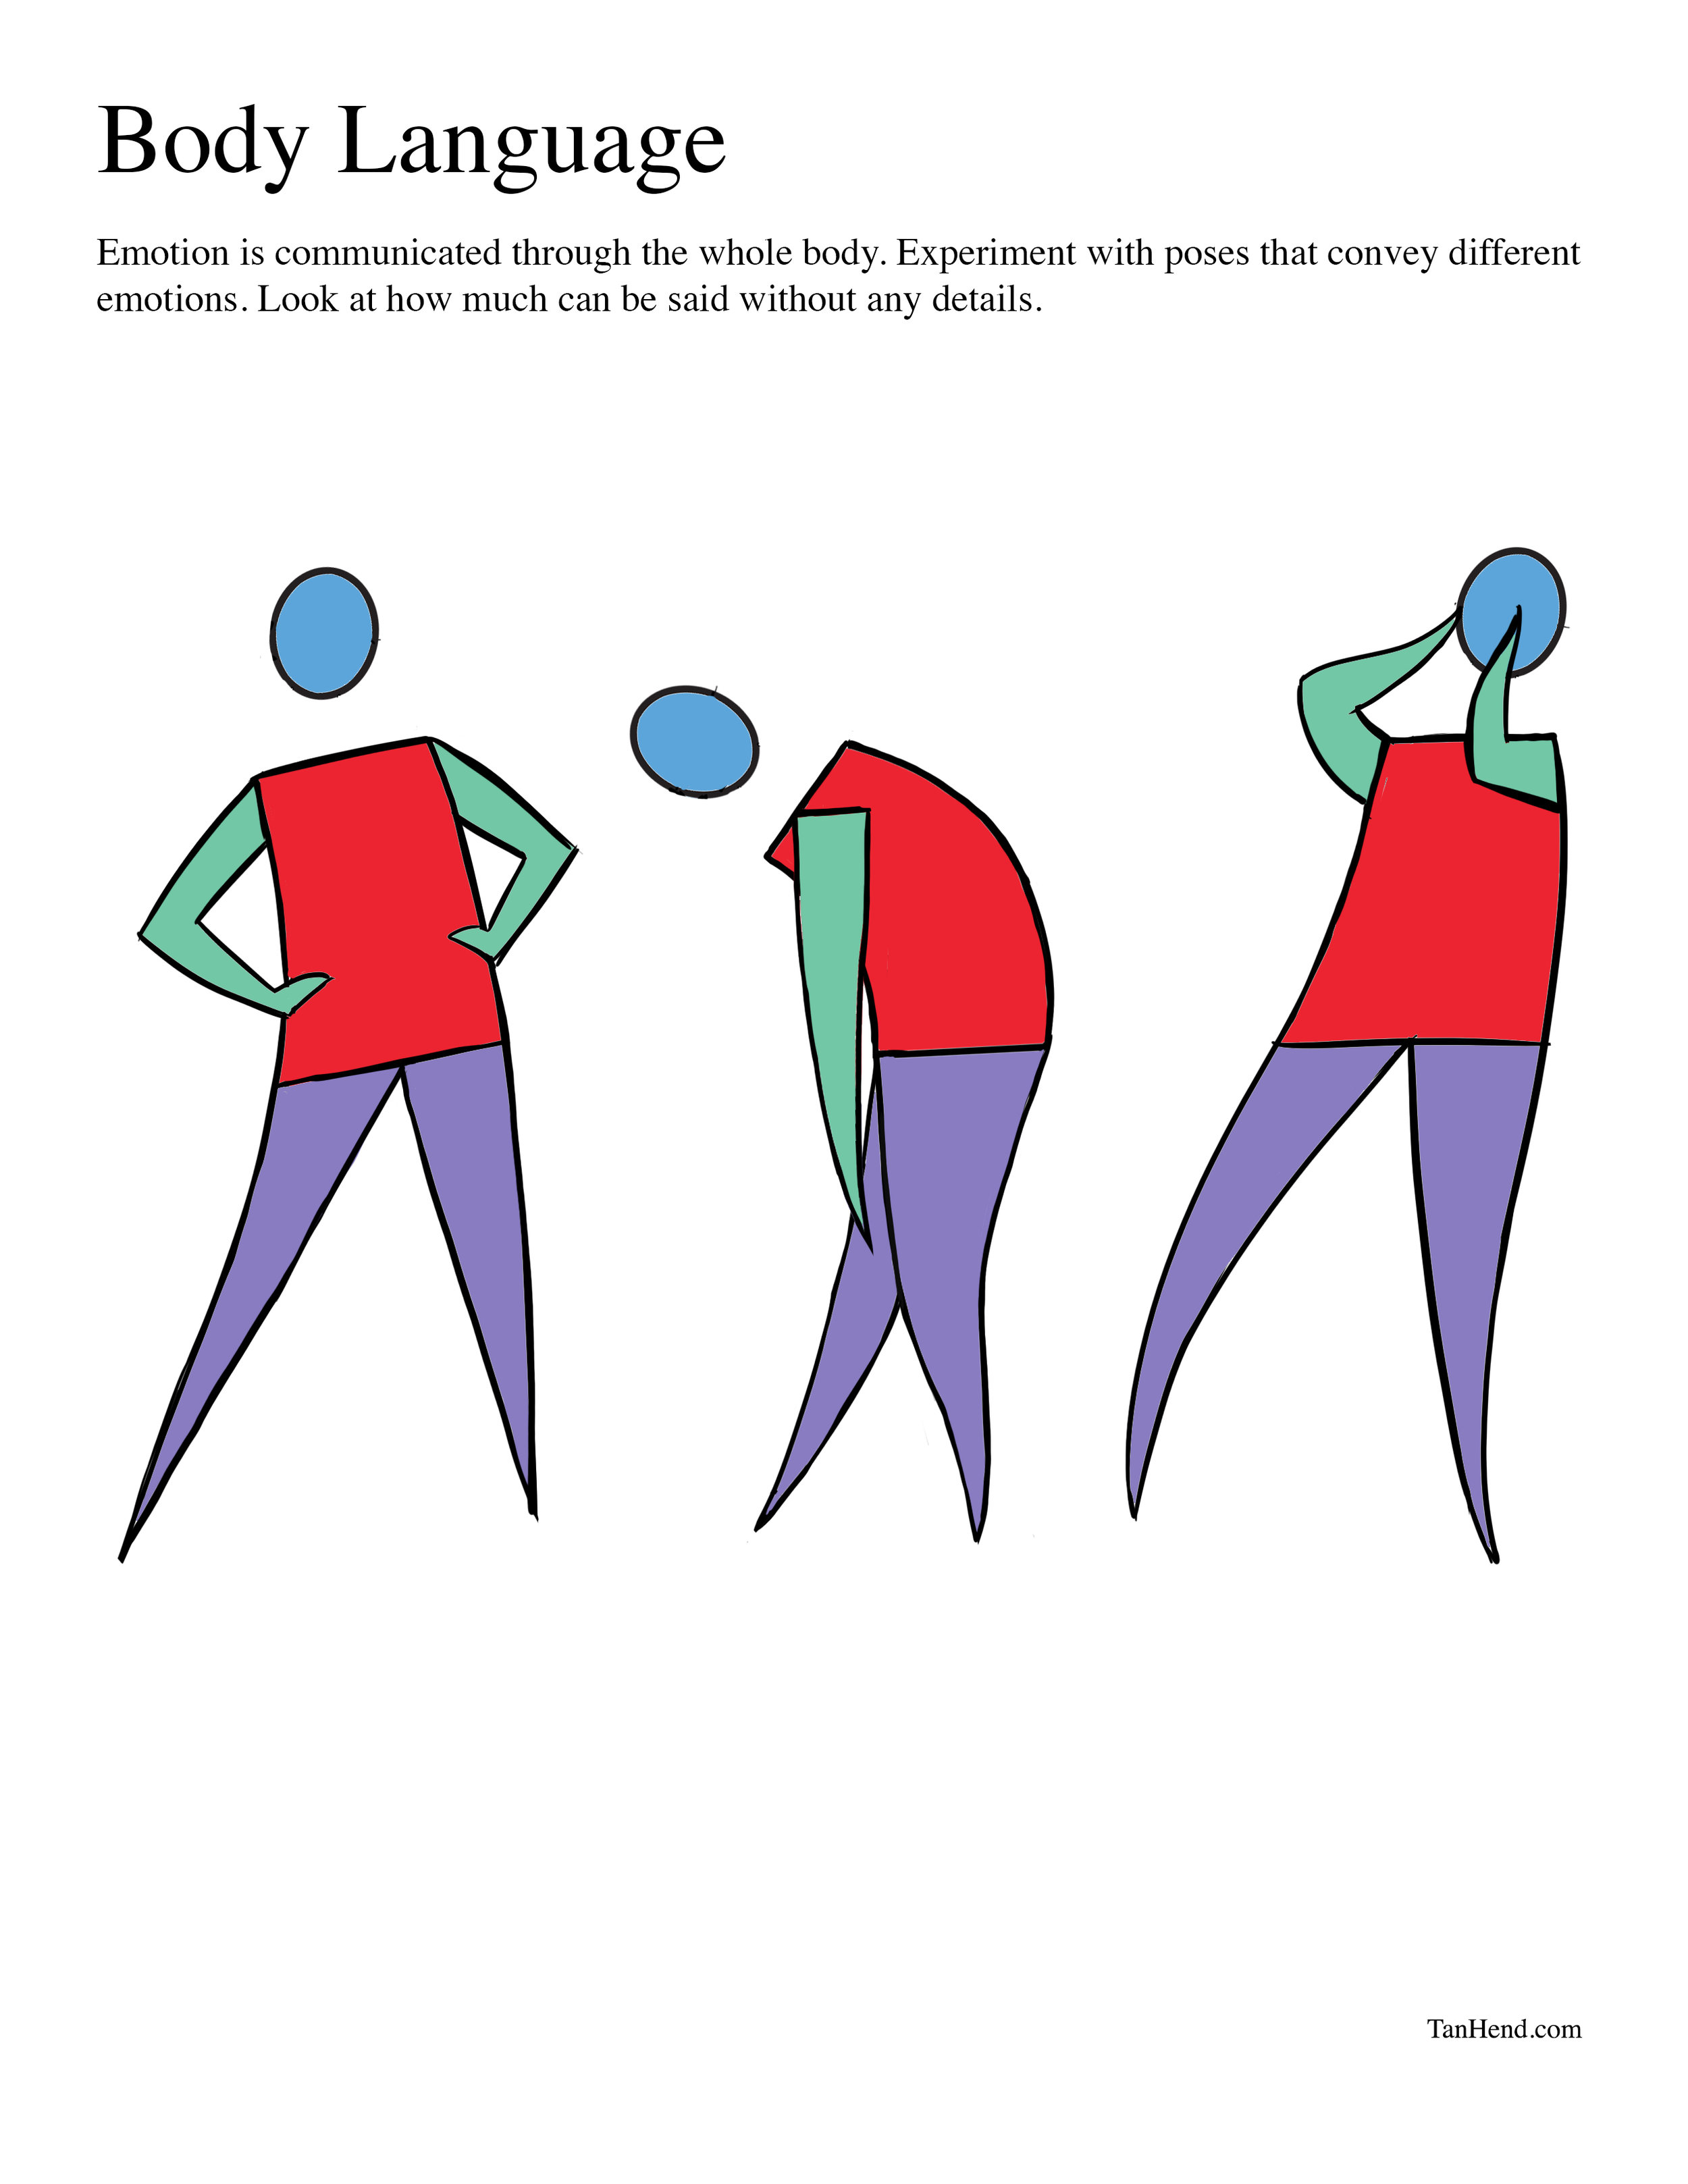 Body_LanguageWeb.jpg